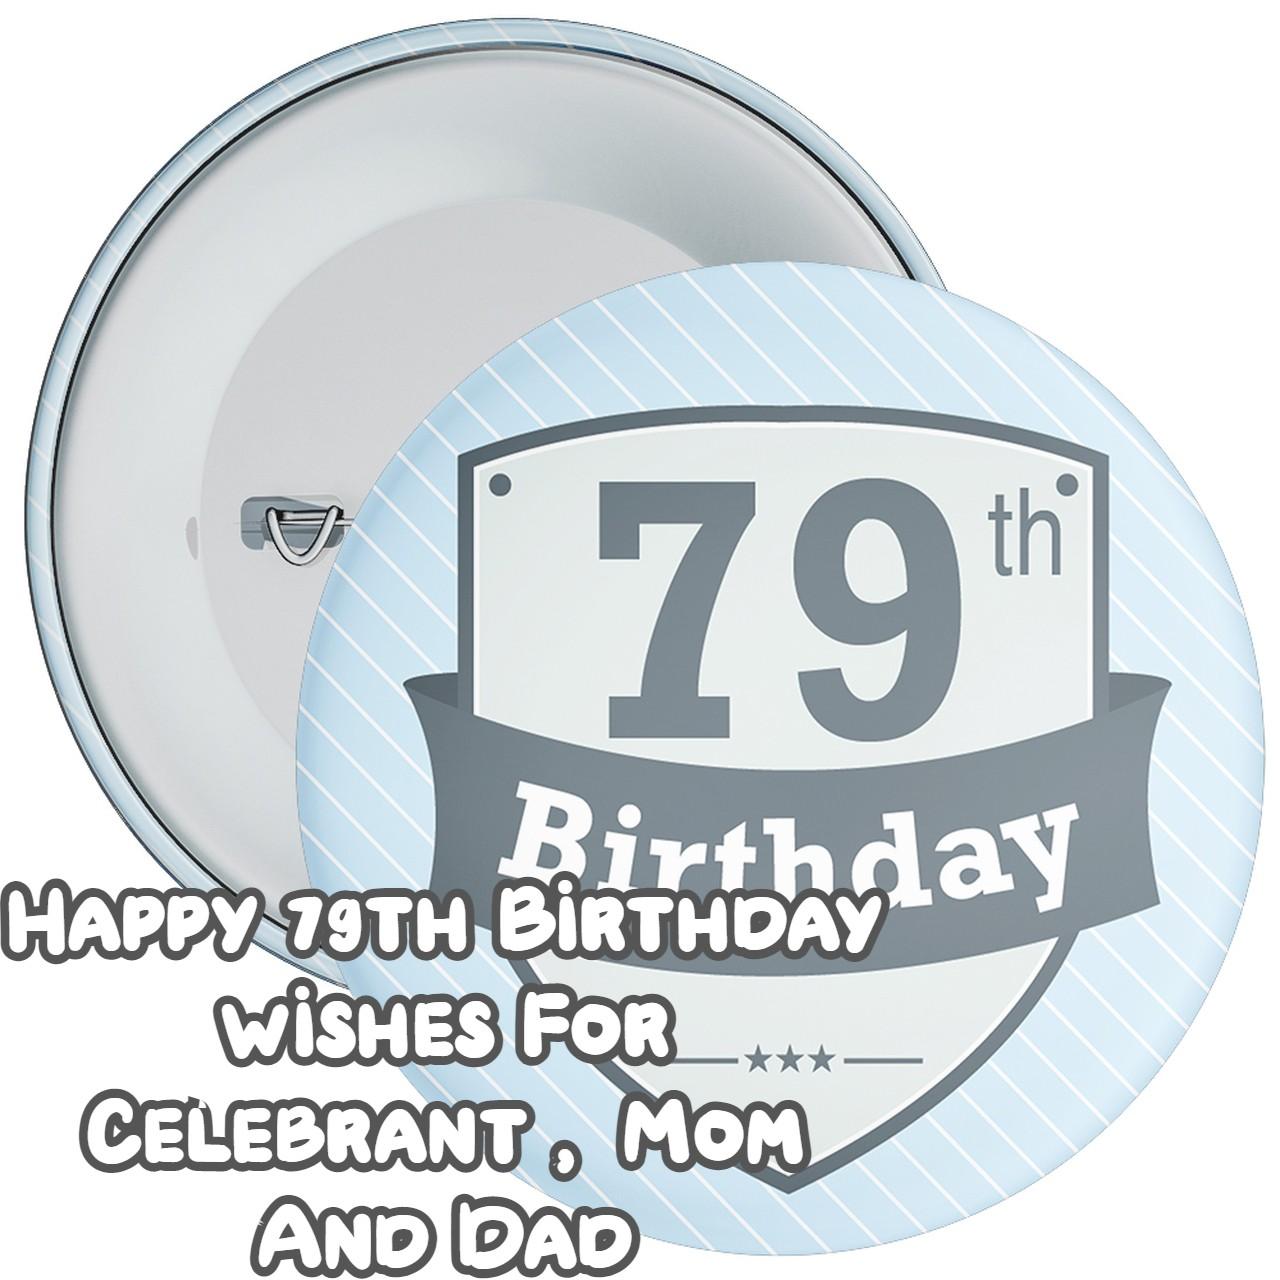 Happy 79th Birthday